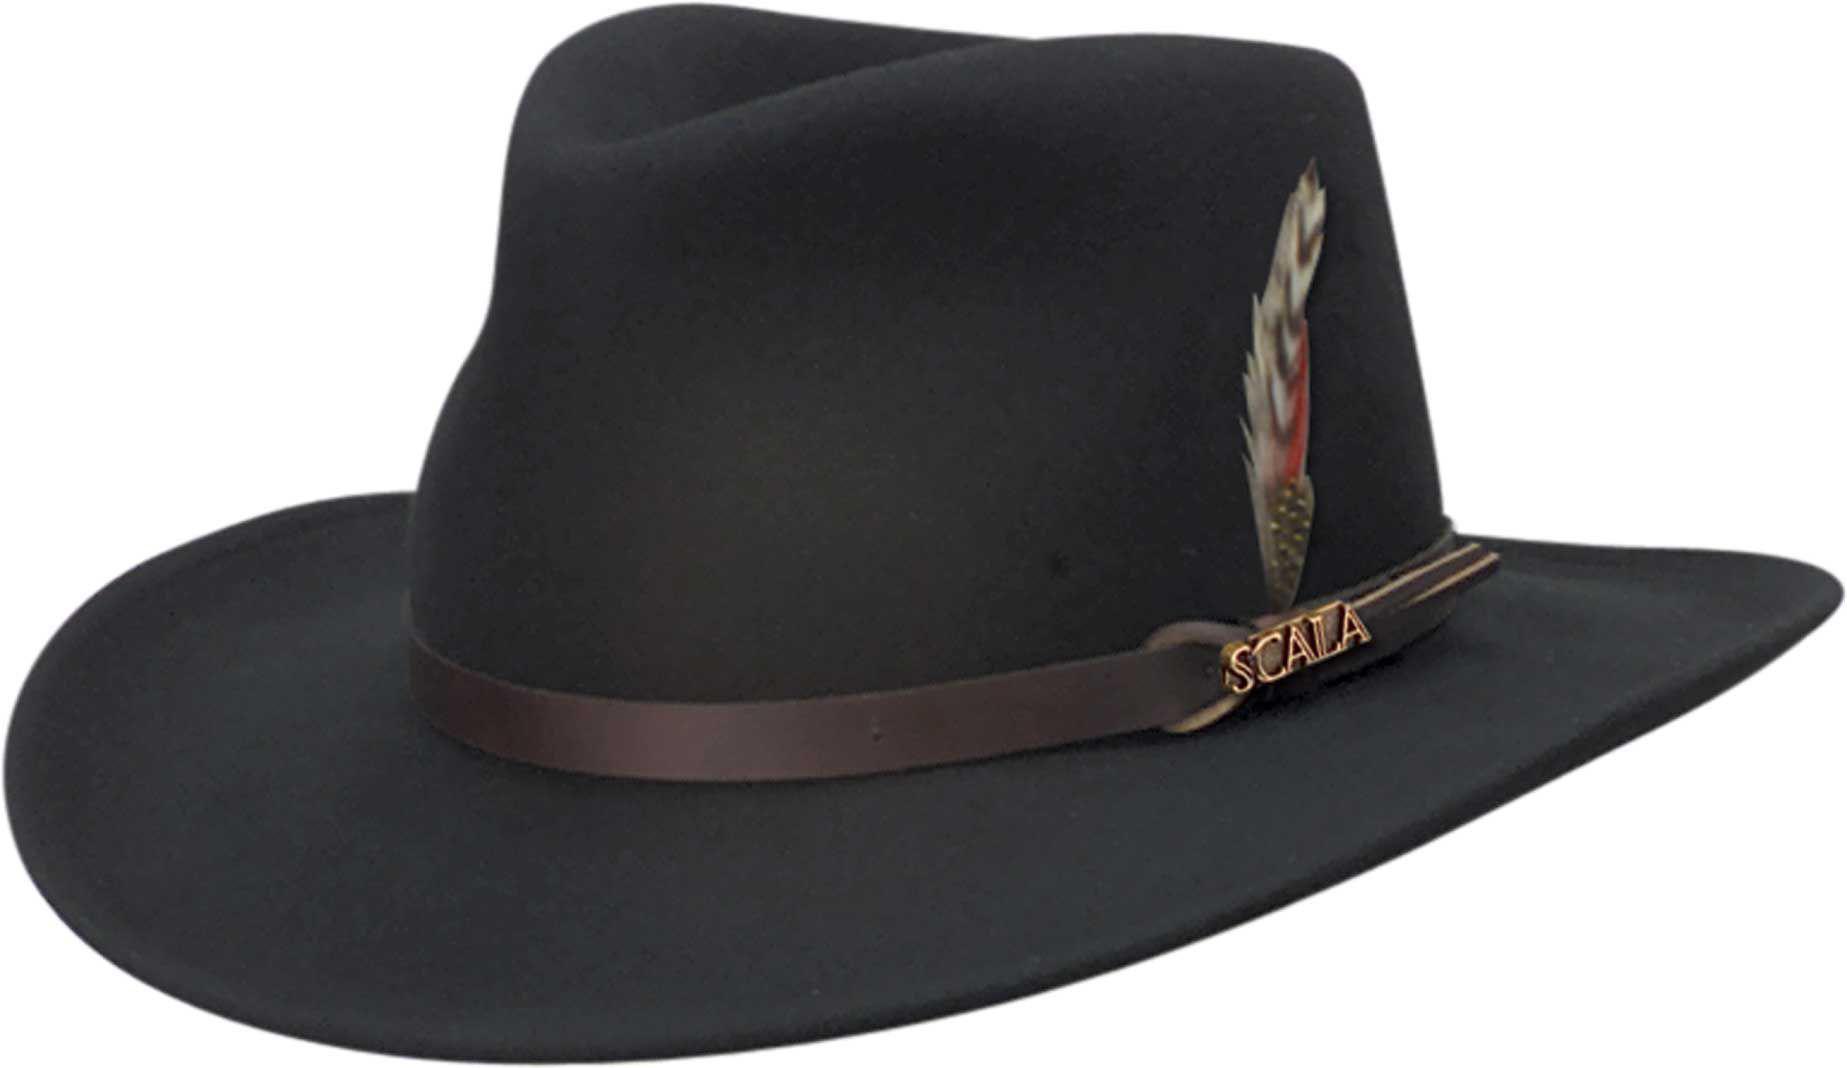 cd1ba51541100 Dorfman Pacific Scala Crushable Felt Outback Hat in Black for Men - Lyst